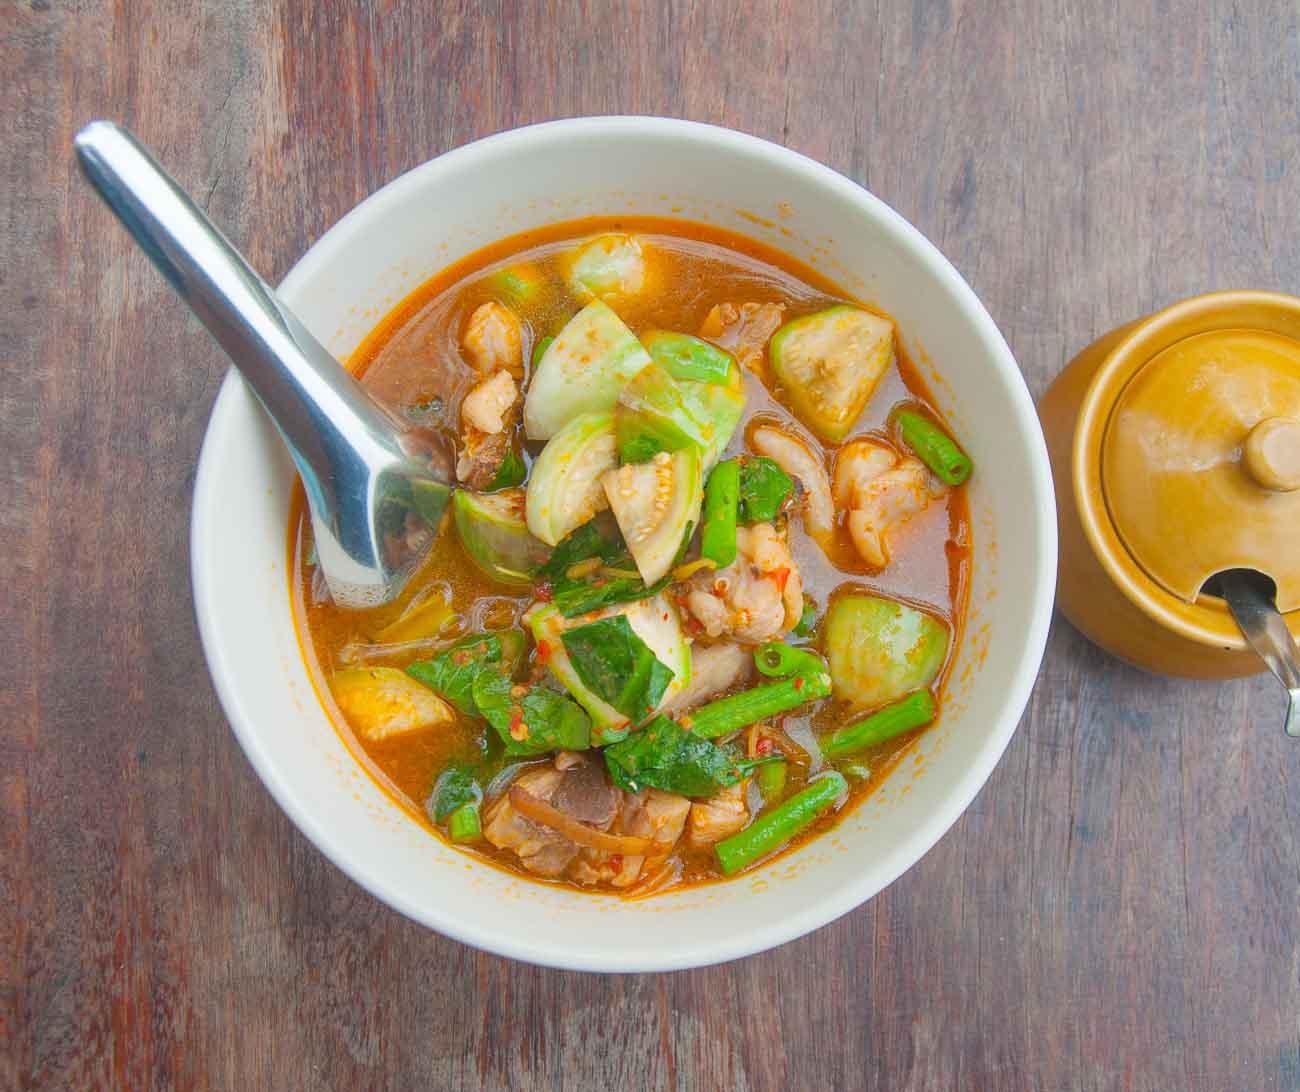 Thai pineapple vegetarian curry recipe by archanas kitchen forumfinder Choice Image